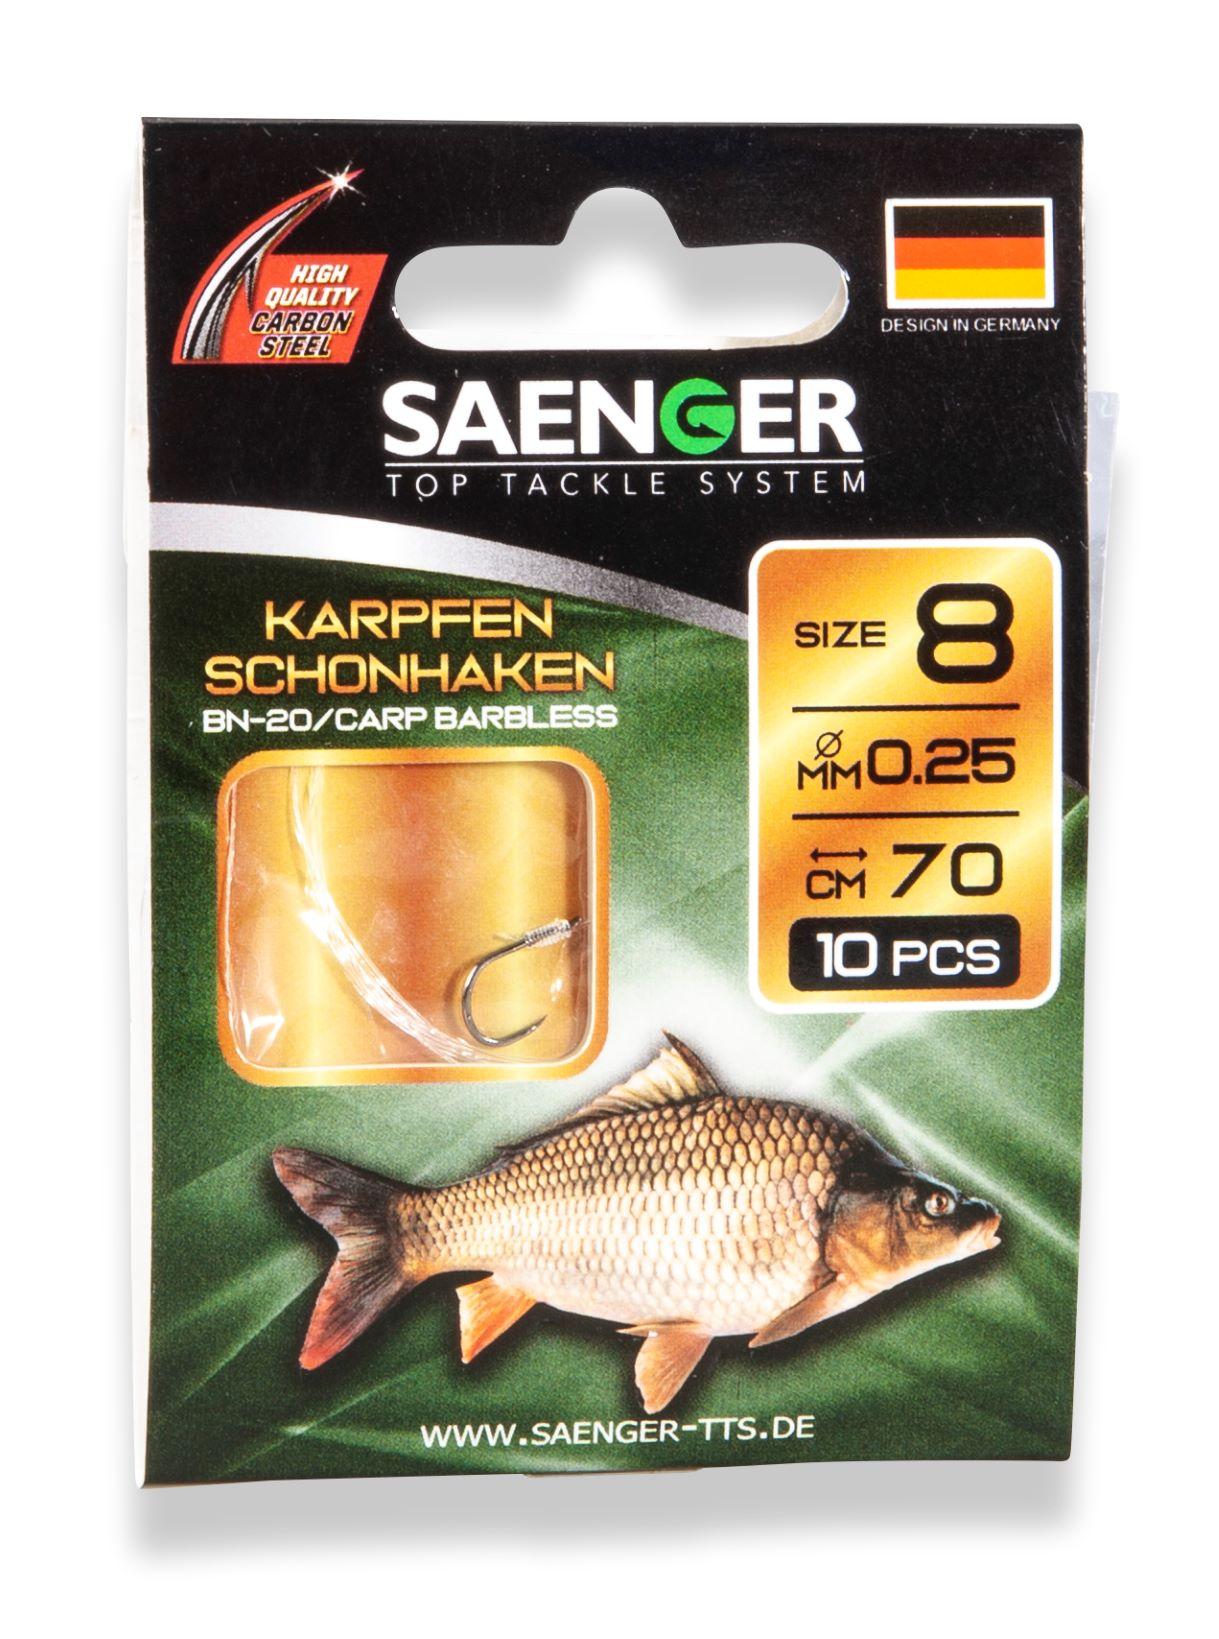 Saenger Návazec na kapry bezprotihrotý Karpfen Schonhaken vel. 6, 10 ks/bal